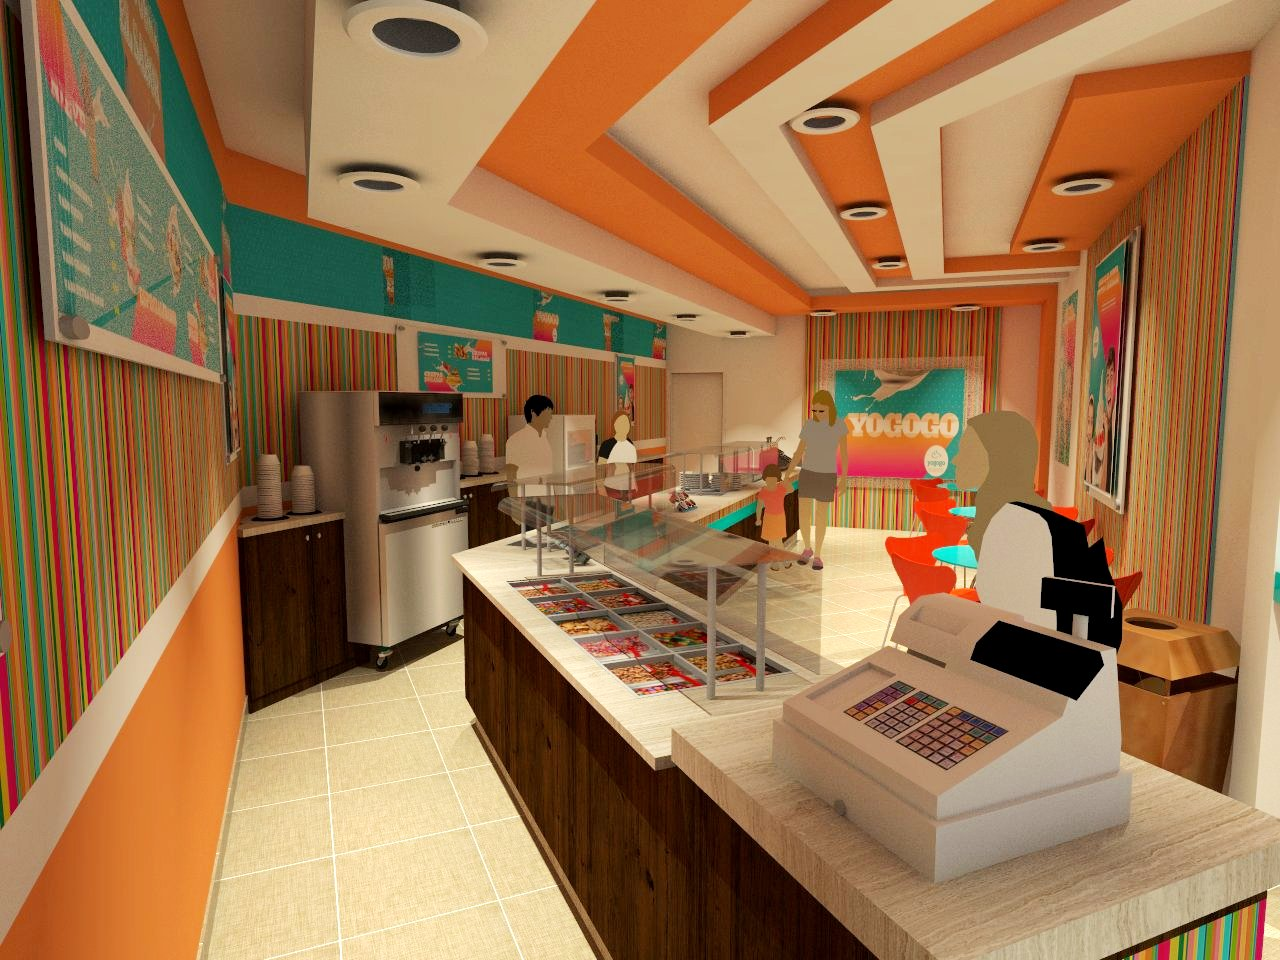 arquitectura martin abel local comercial yogurt yogogo